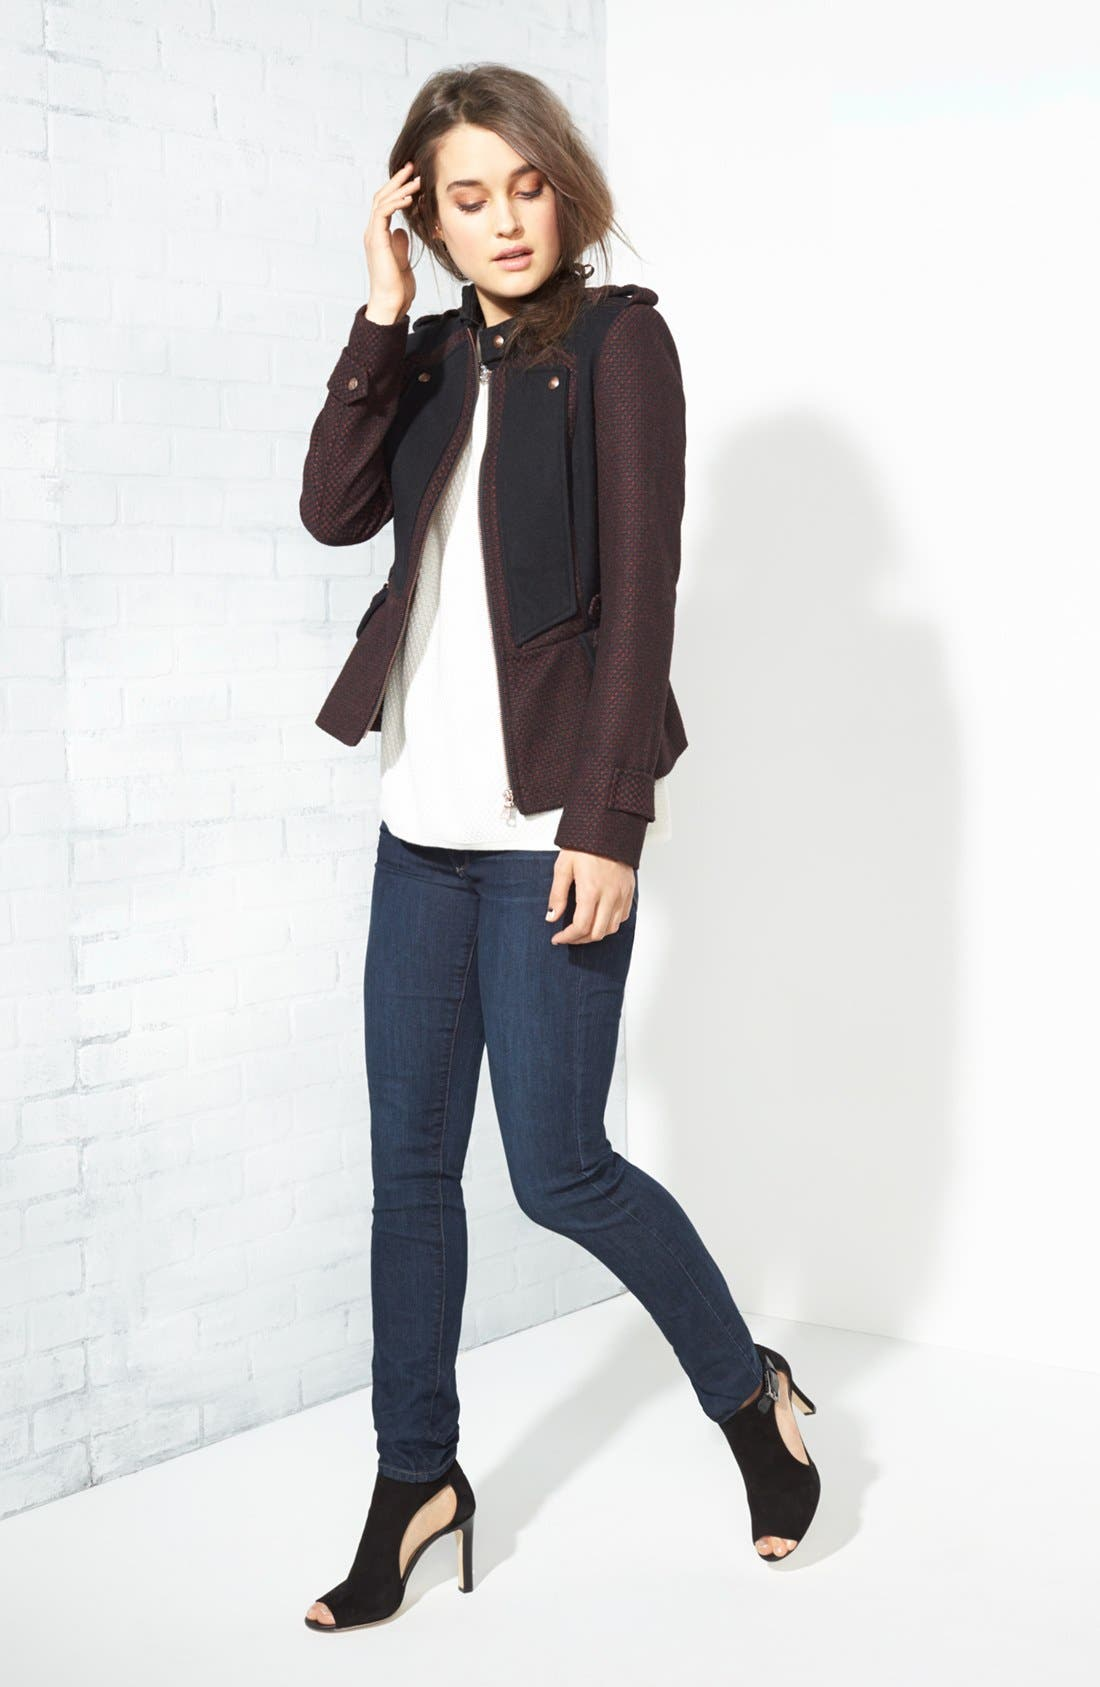 Alternate Image 1 Selected - Sam Edelman Jacket, Hinge® Sweater & Paige Denim Jeans